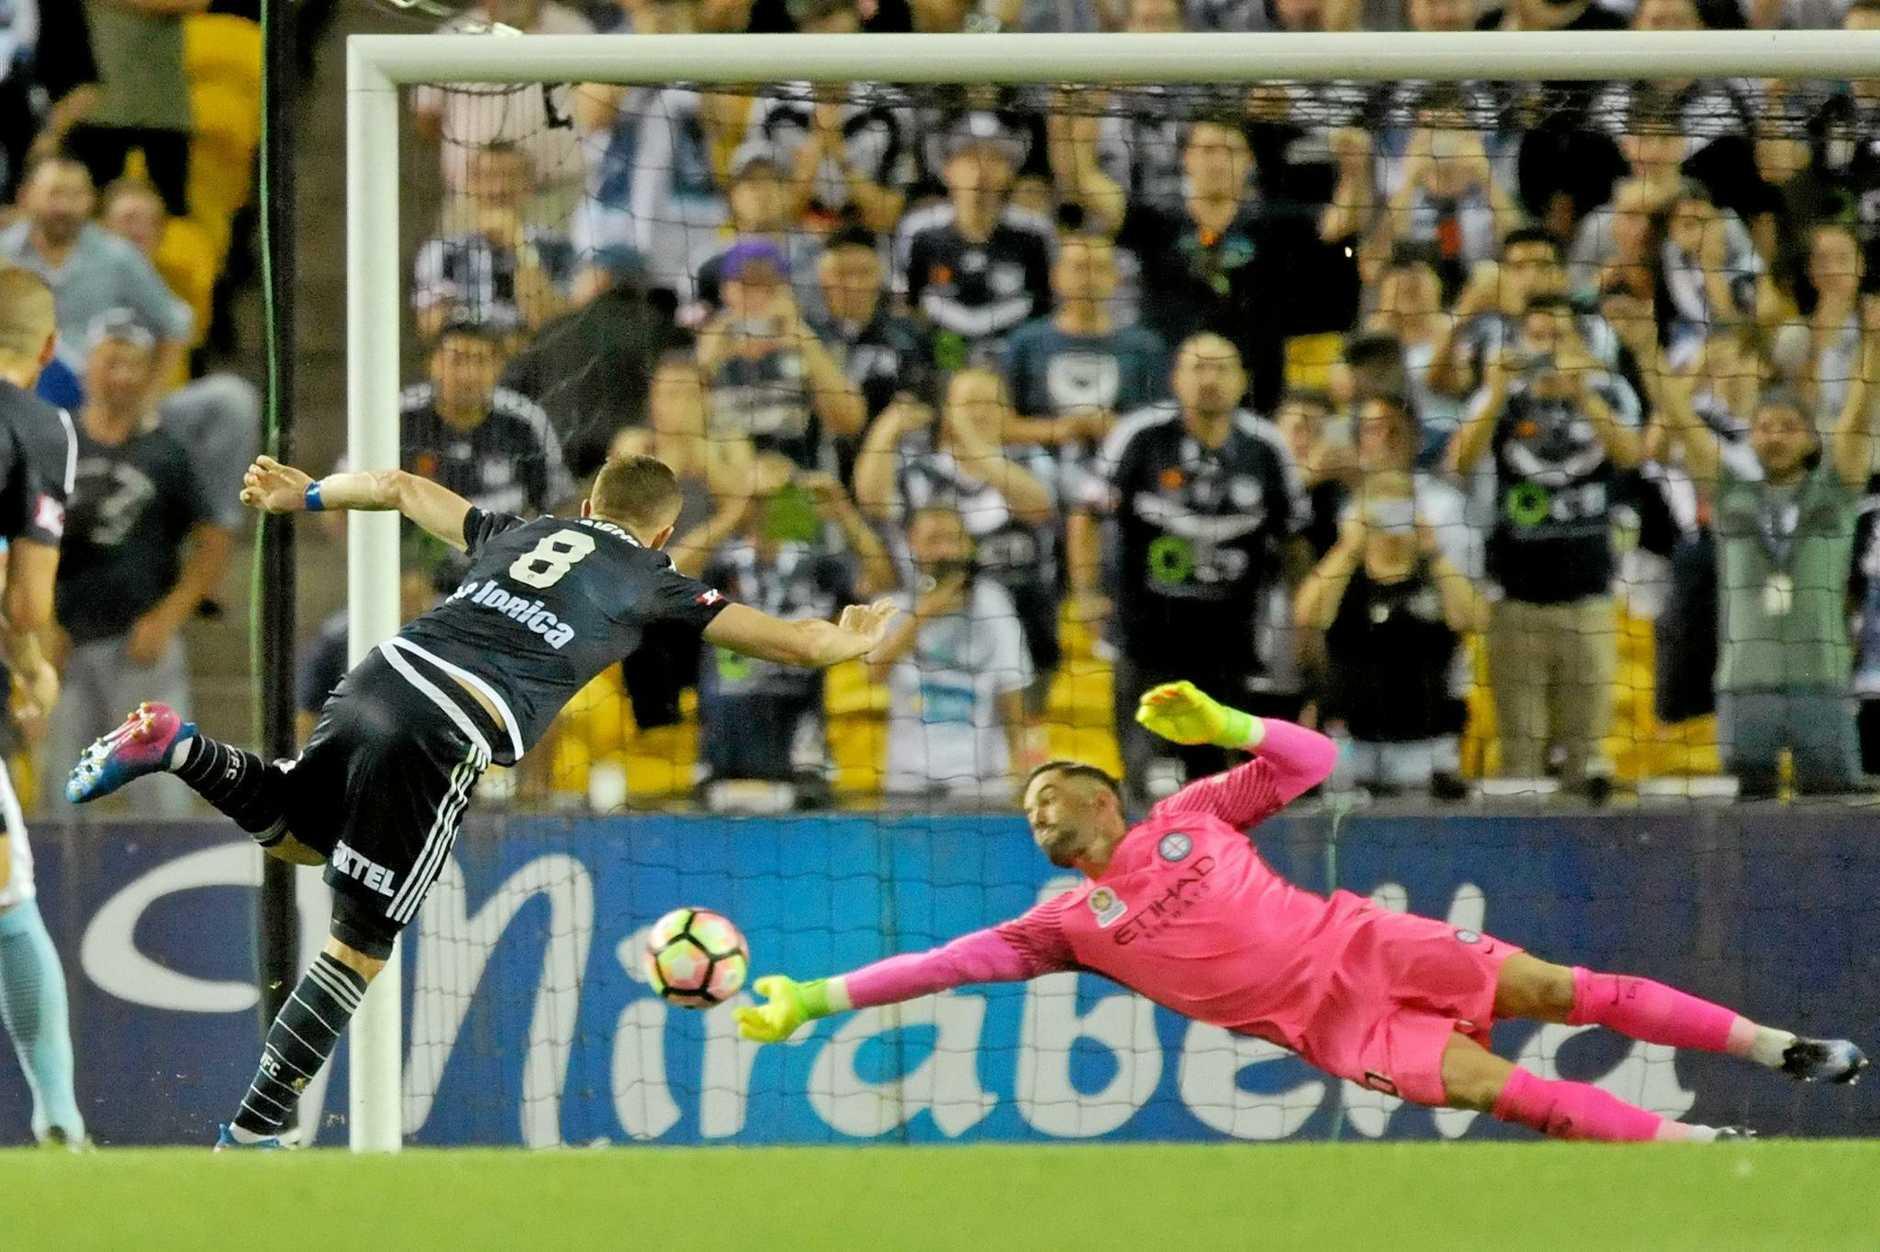 Melbourne City goalkeeper Dean Bouzanis dives to save Melbourne Victory striker Besart Berisha's penalty in Saturday night's heated derby at Etihad Stadium.